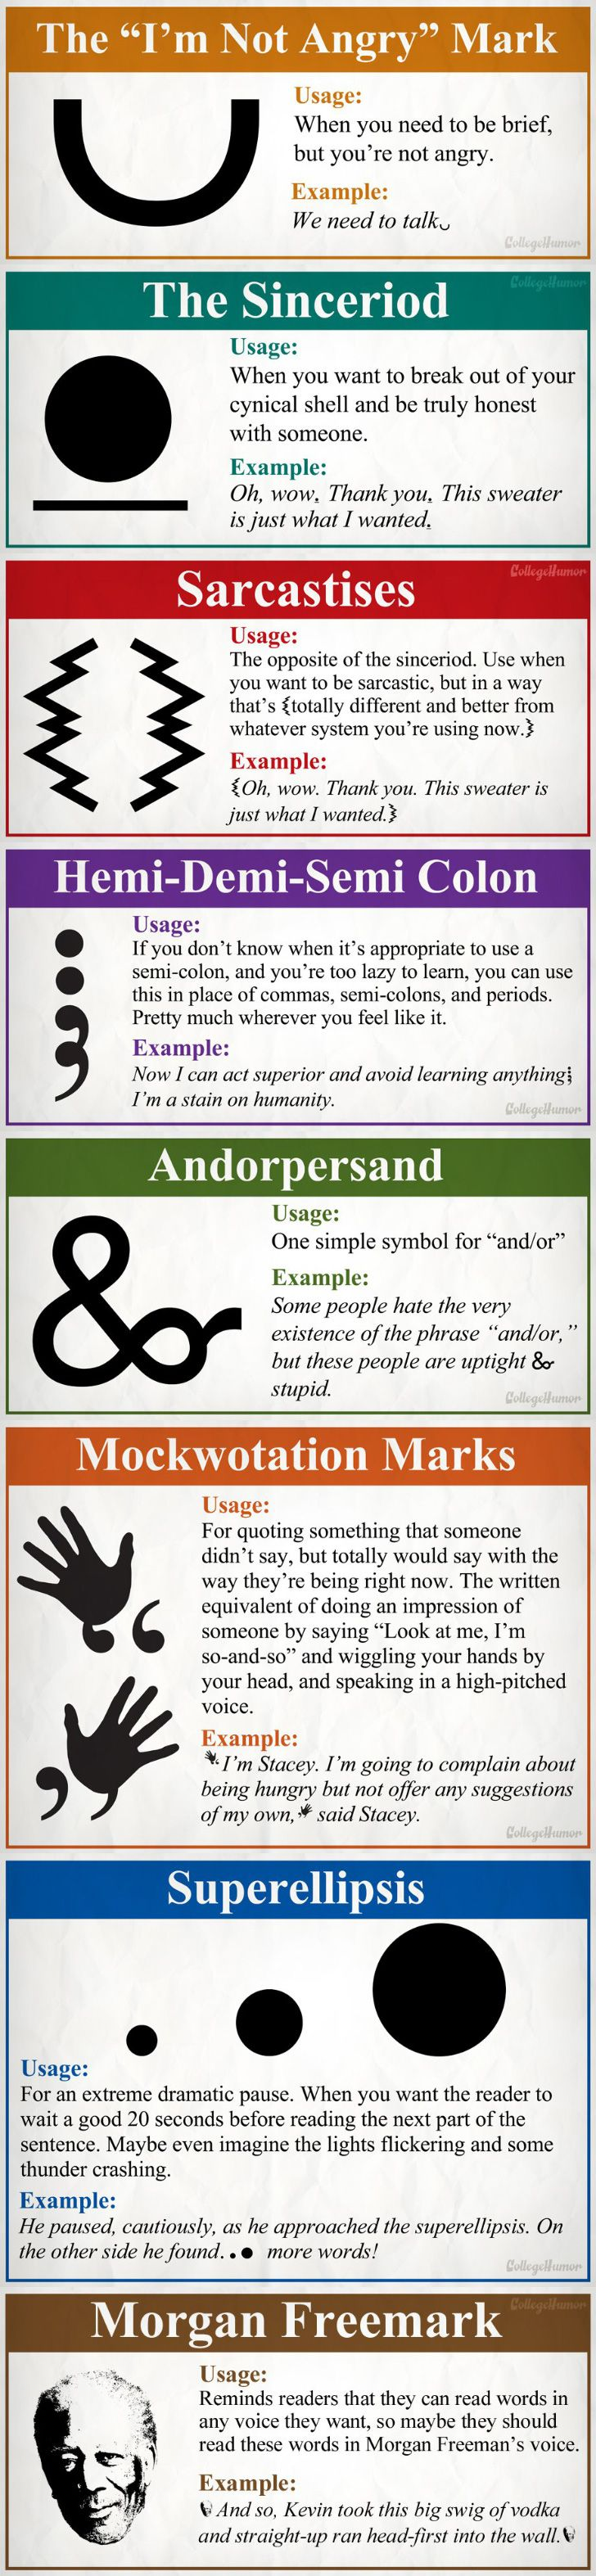 8 new and necessary punctuation marks.  Lol @Eowyn Campbell @Alex Jones Jones Jones Leichtman Campbell